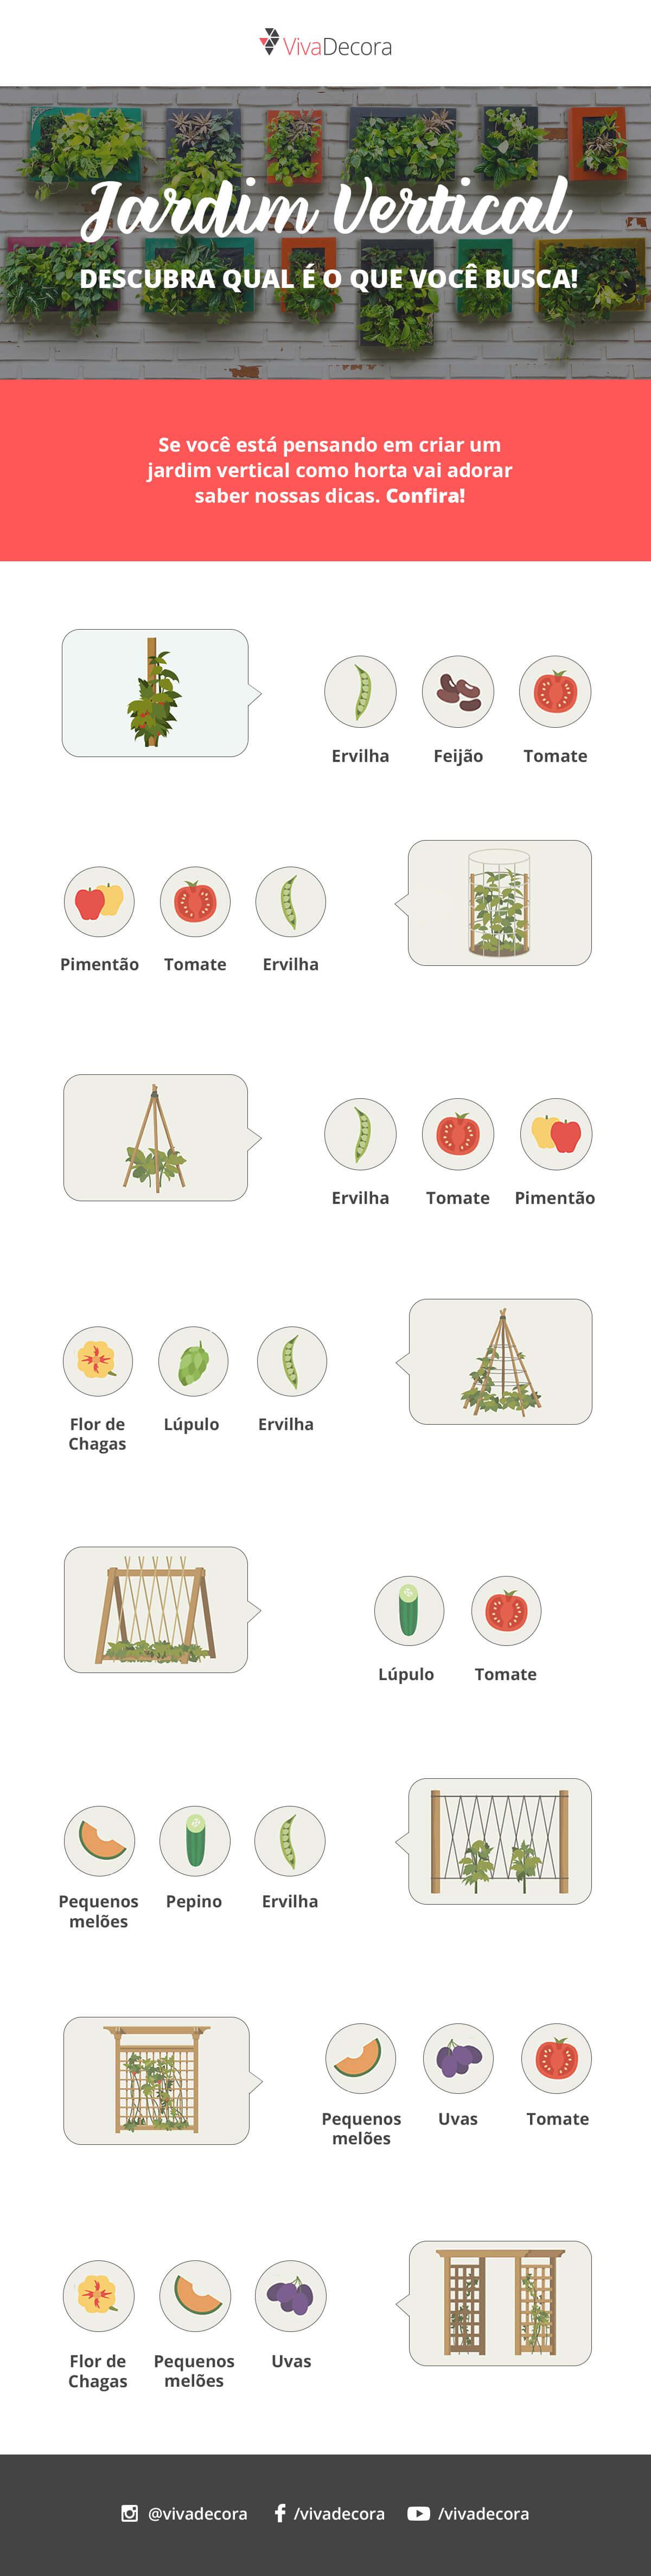 Infográfico - Jardim Vertical